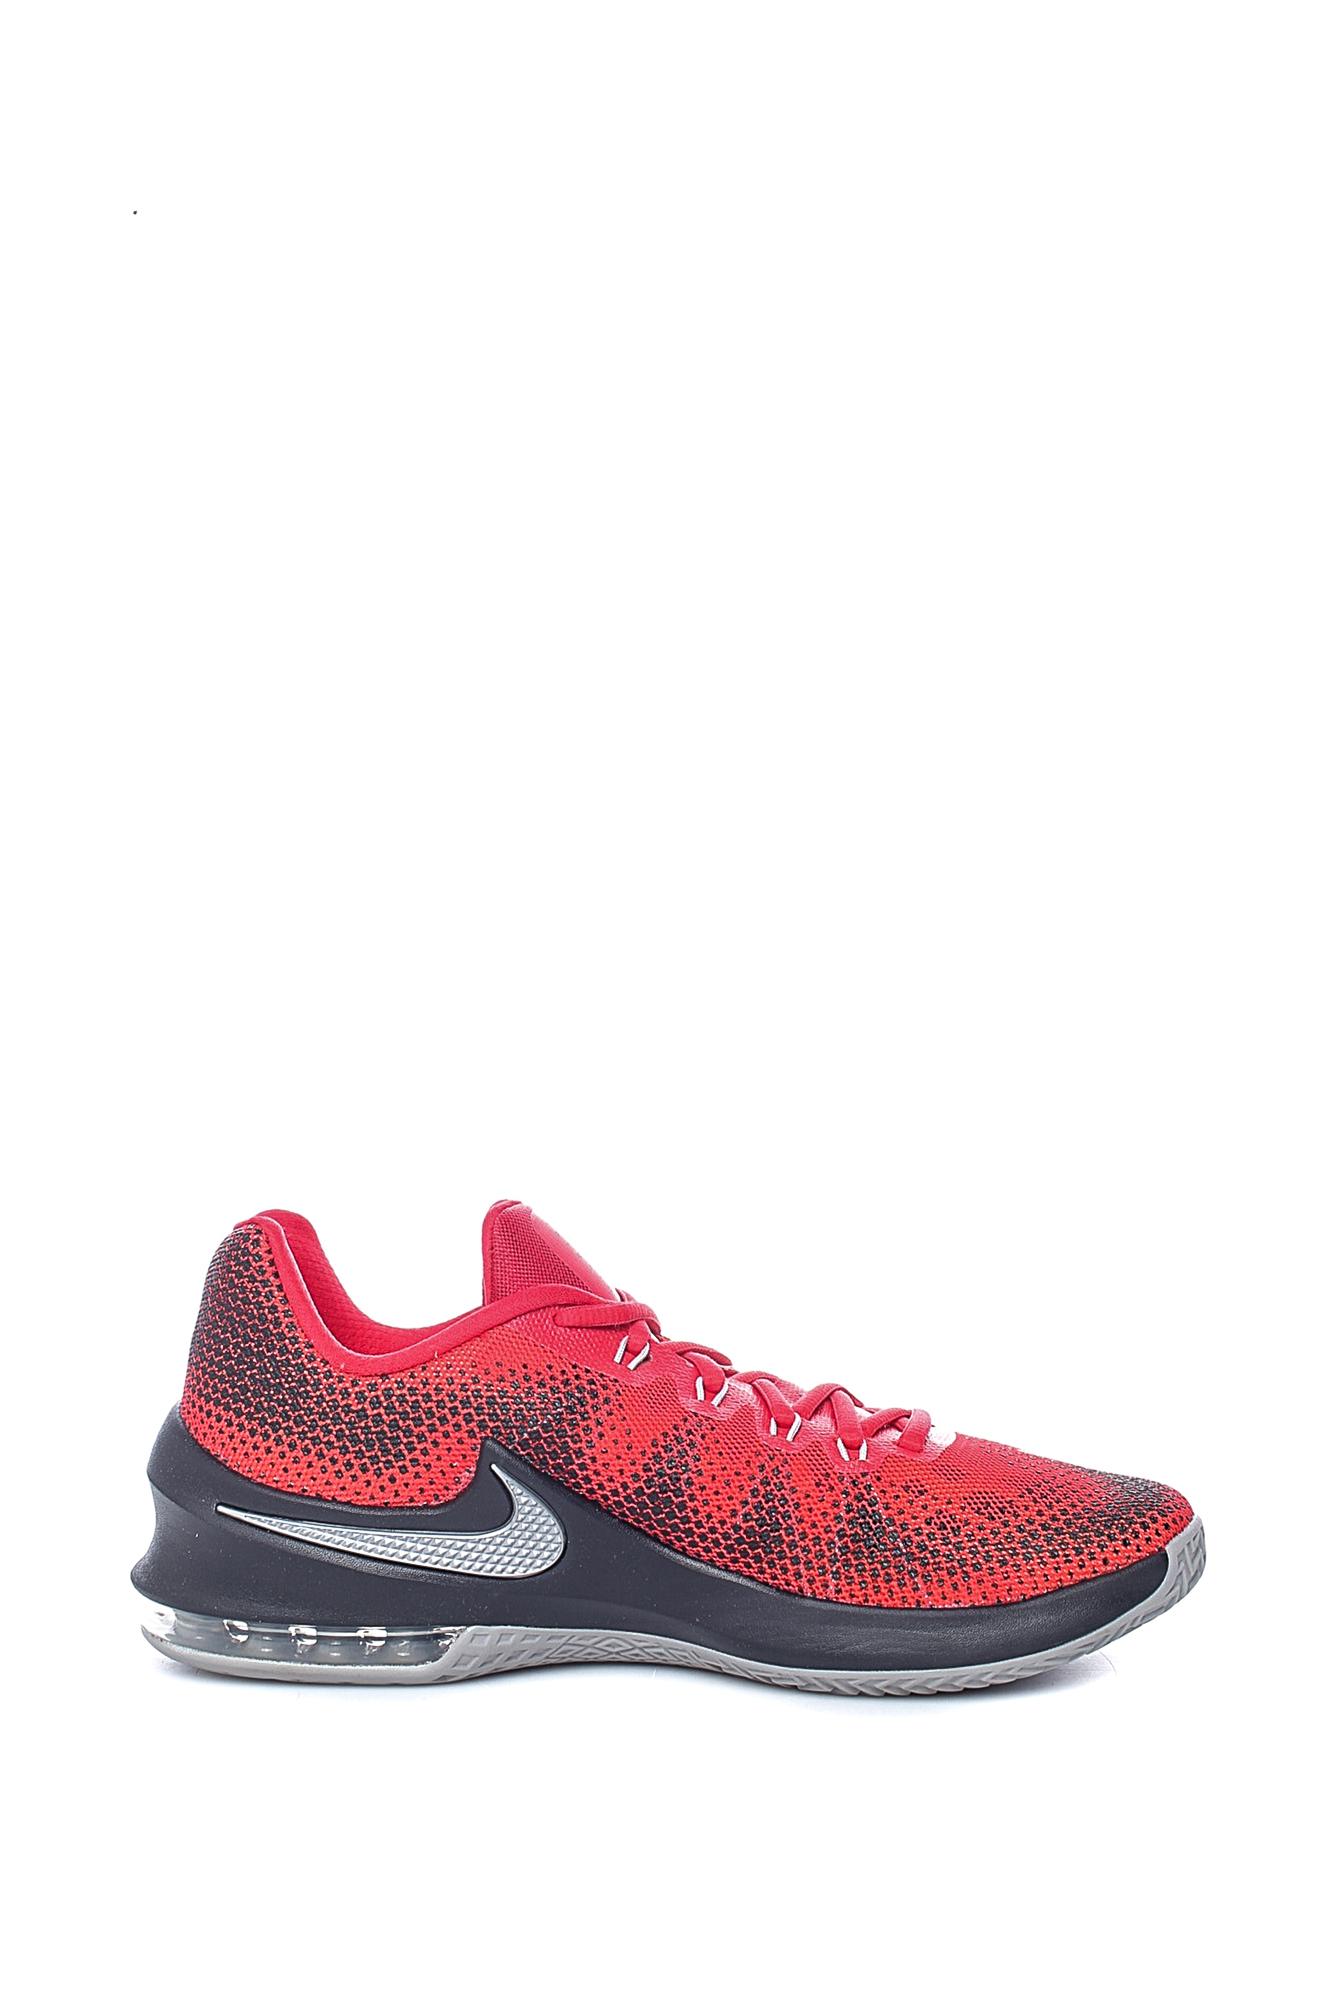 NIKE – Ανδρικά παπούτσια μπάσκετ Nike AIR MAX INFURIATE LOW κόκκινα